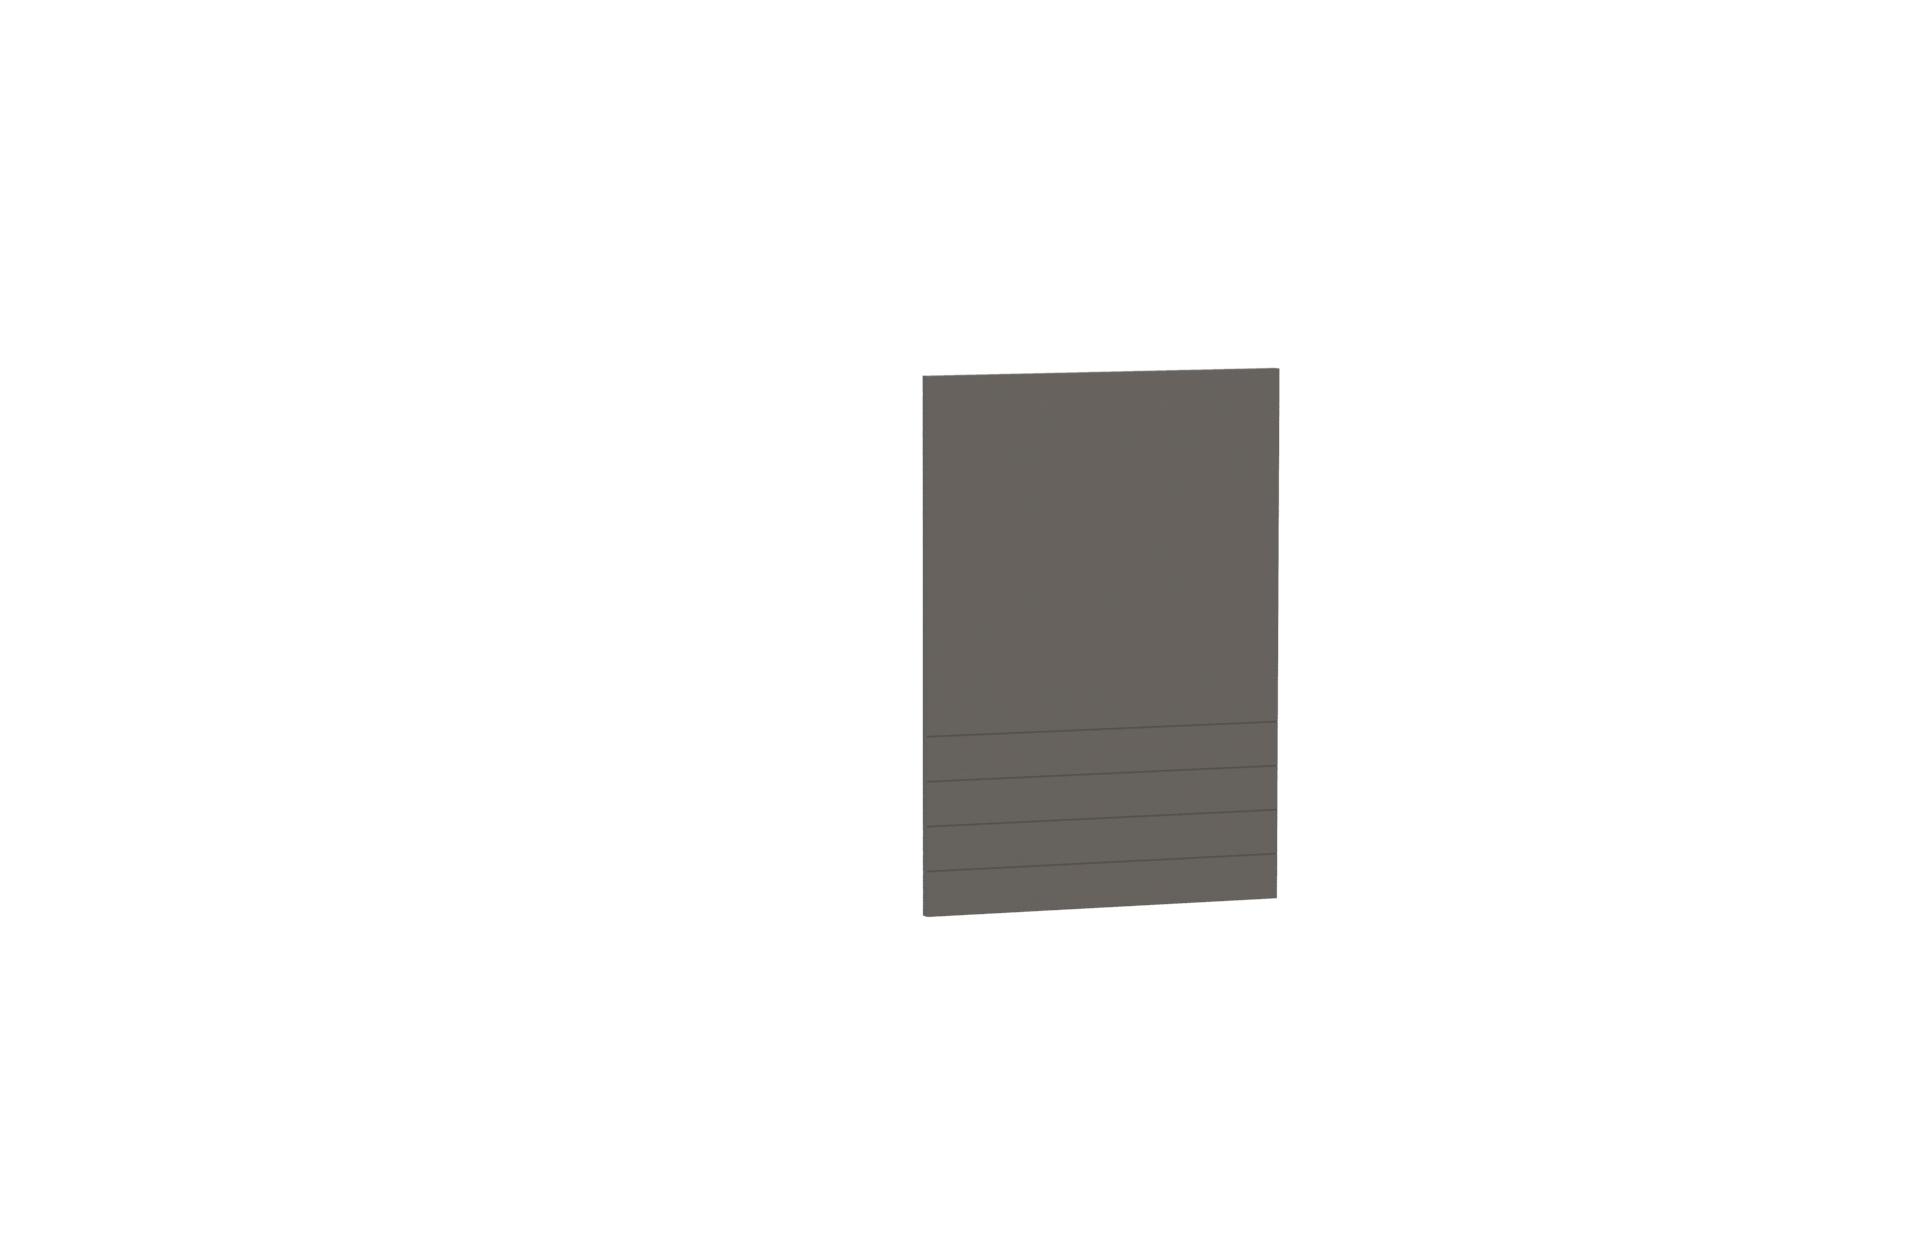 Geschirrspülerfront 60 cm Teilintegrierbar Paula Grau